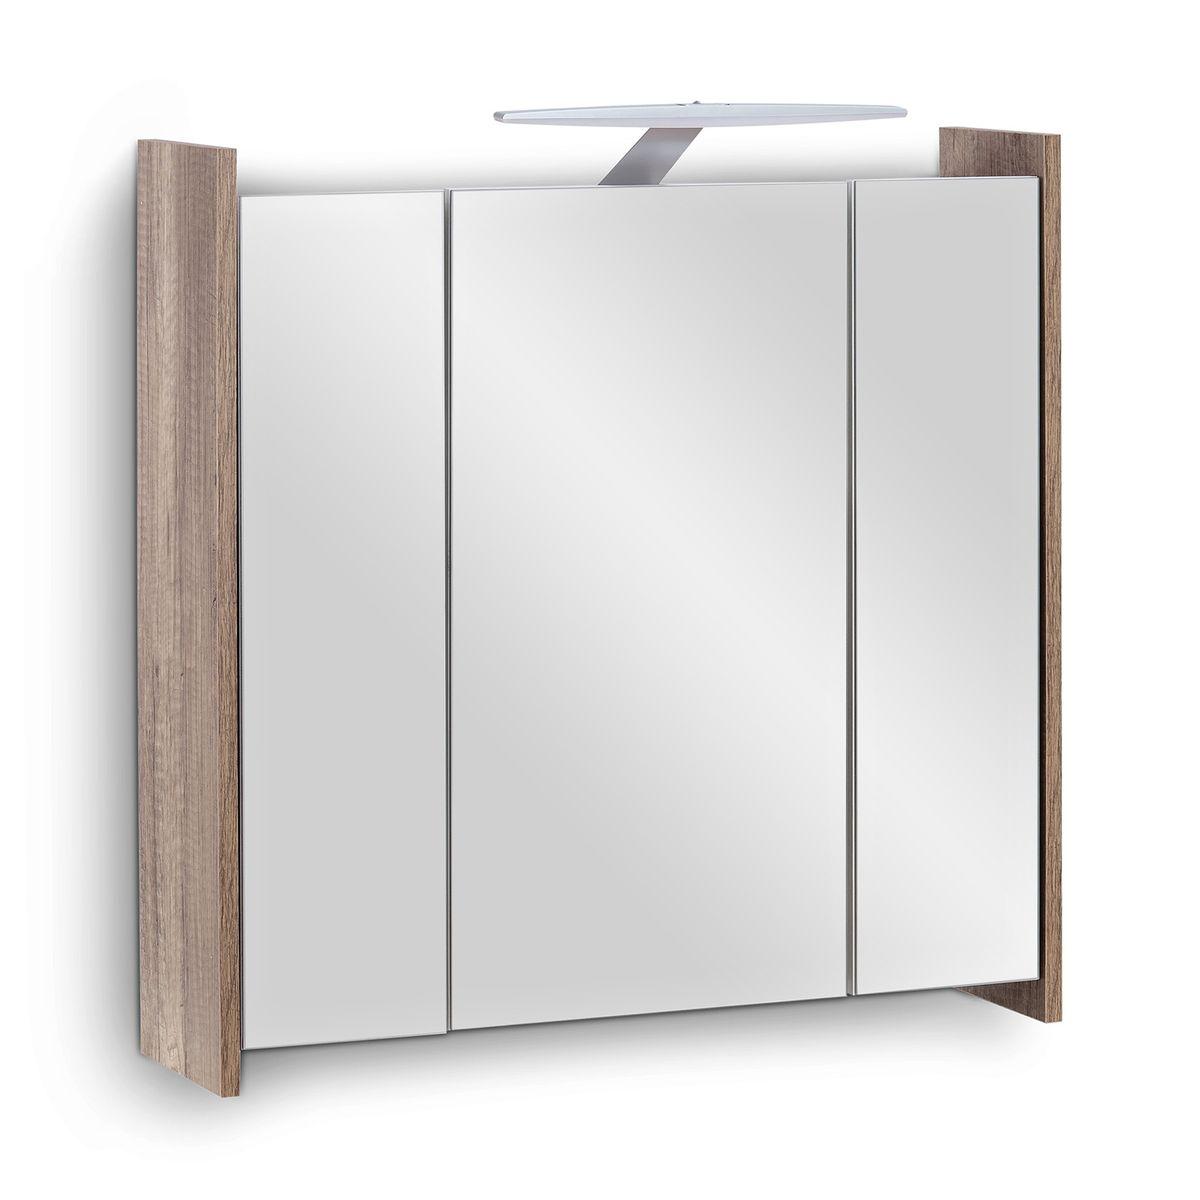 Galdem Spiegelschrank Elegance 70 cm mit Steckdose Monumental OAK